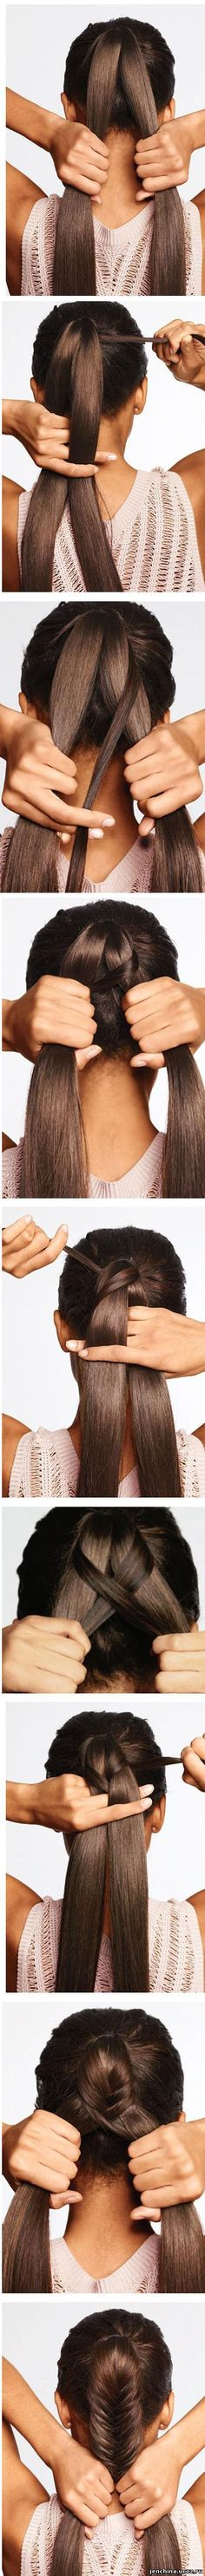 Easy hairstyles for everyday - Fishtail braid ponytail Pretty Hairstyles, Braided Hairstyles, Wedding Hairstyles, Fishtail Braids, Braid Ponytail, Updo, Hair Day, Hair Designs, Hair Looks